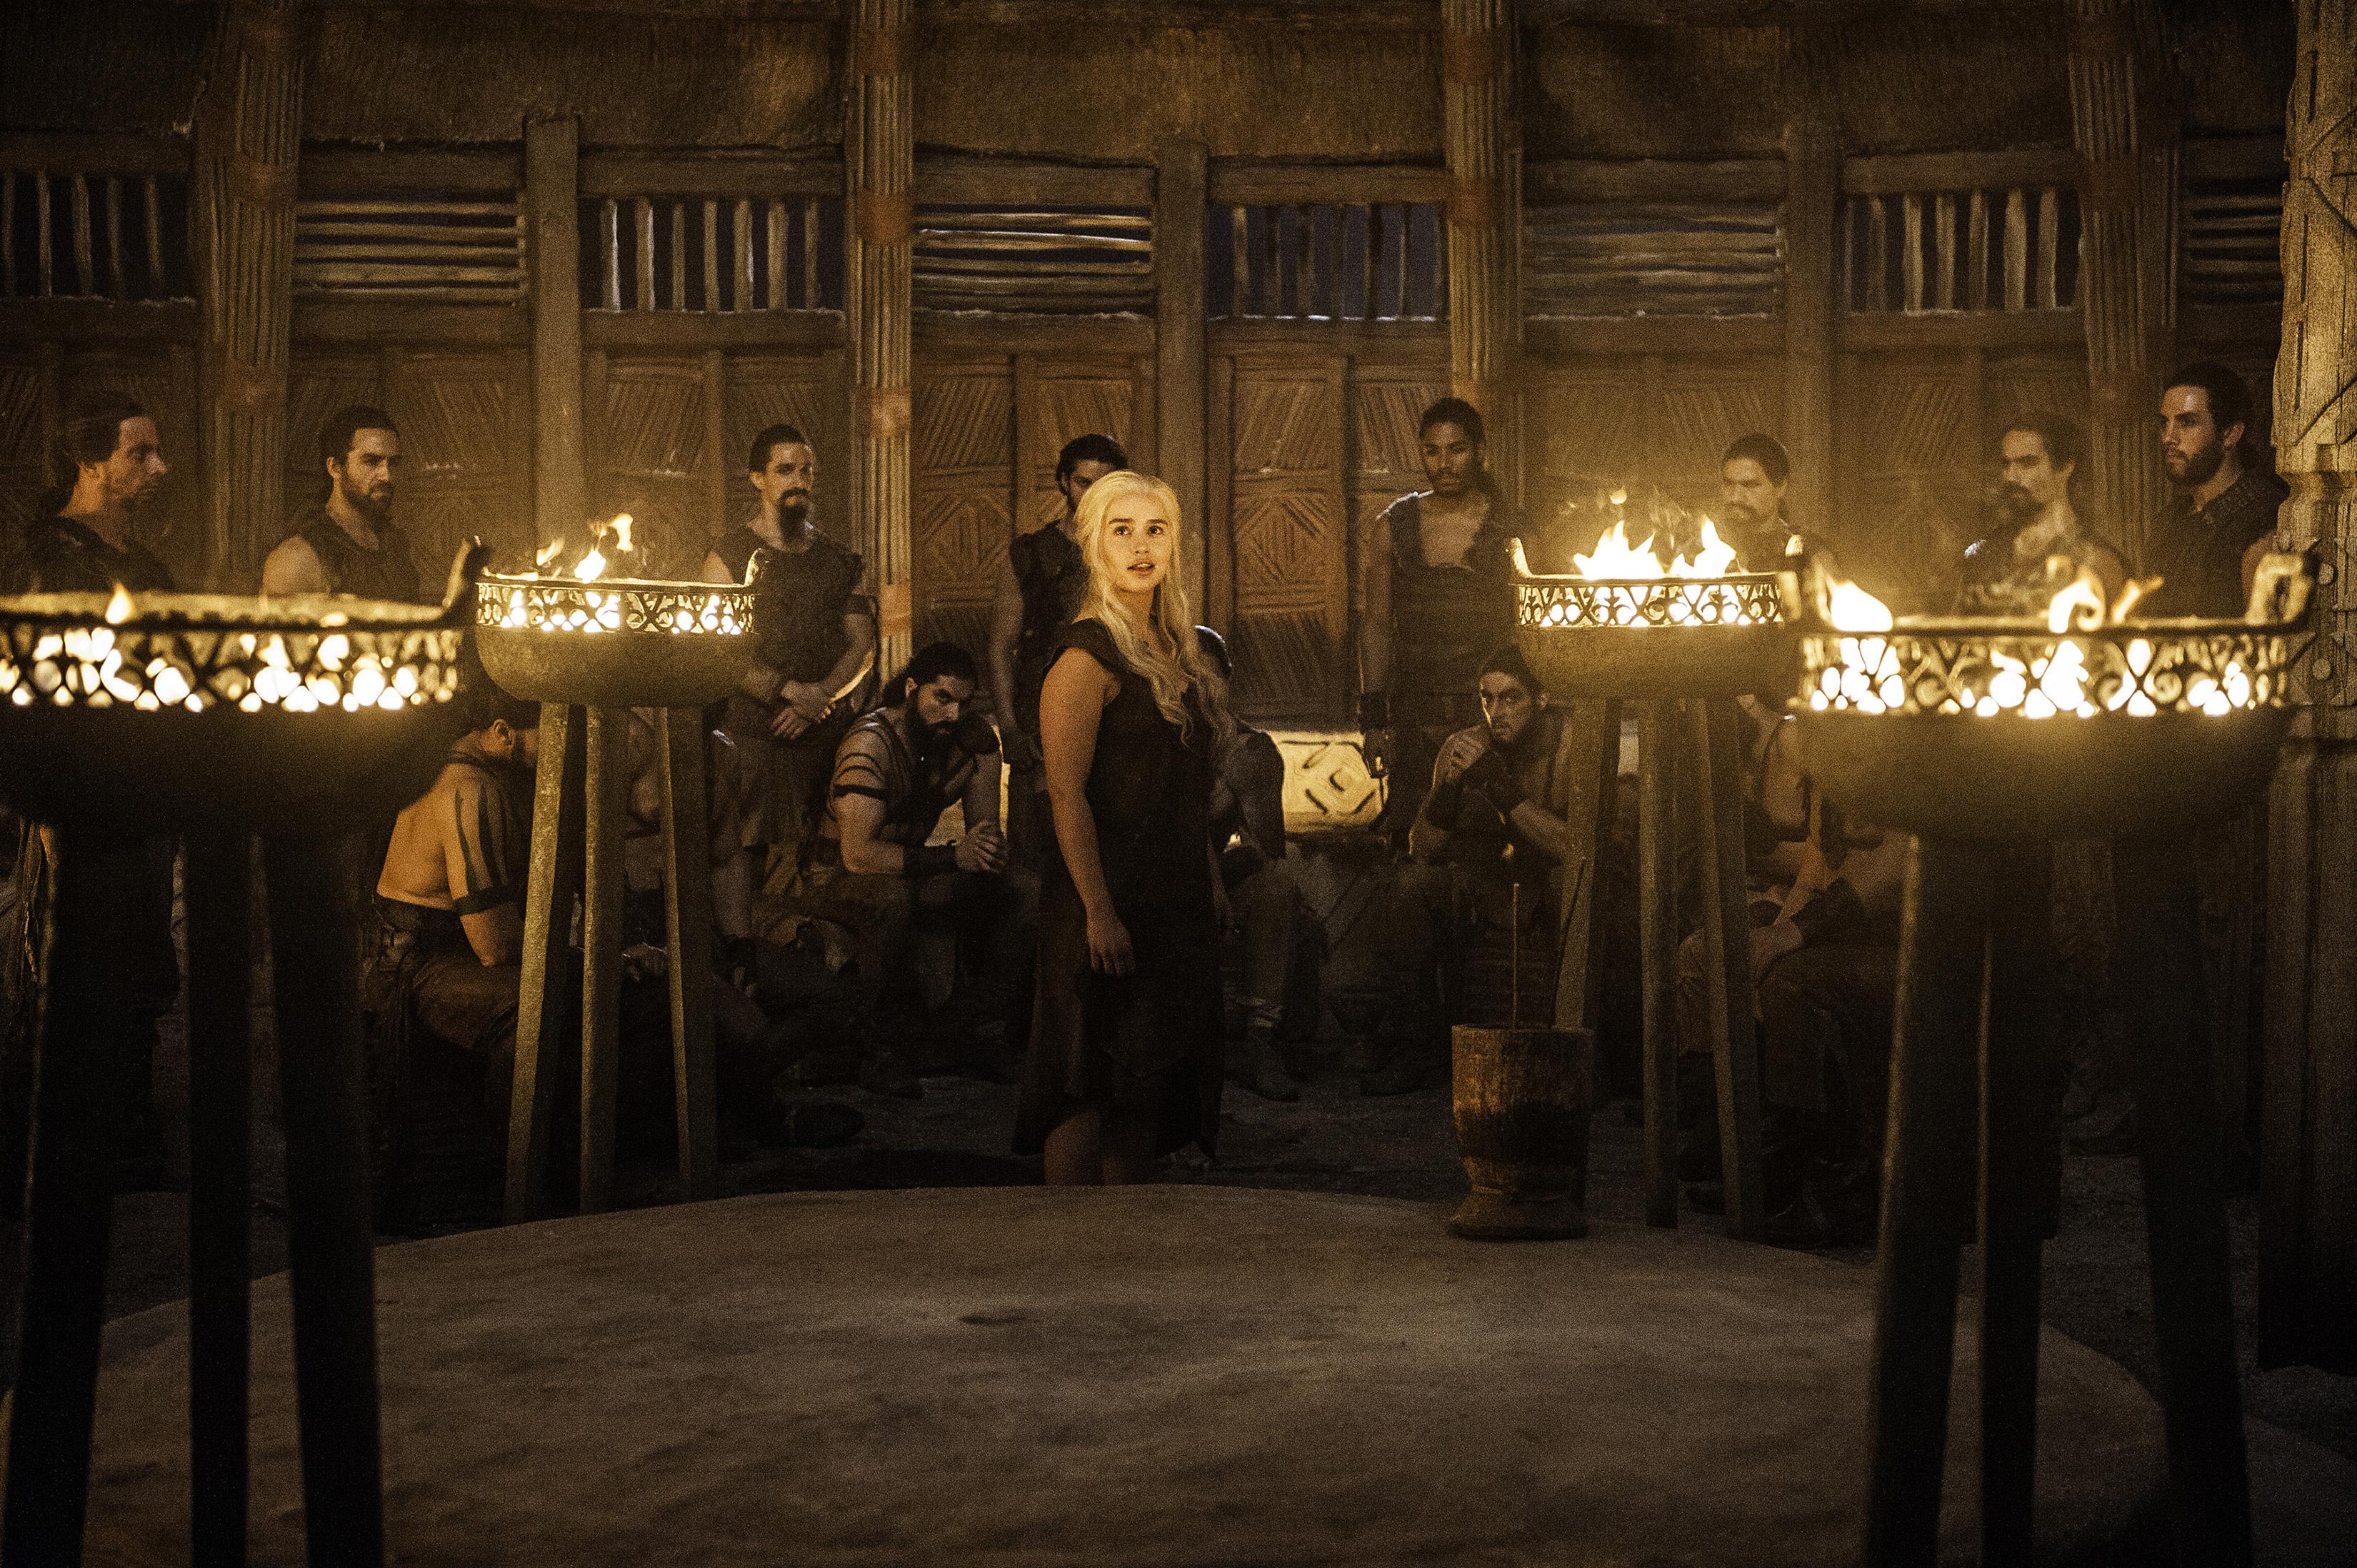 Joseph Naufahu, Tamer Hassan, Emilia Clarke, Elie Haddad, Darius Dar Khan, and Diogo Sales in Game of Thrones (2011)